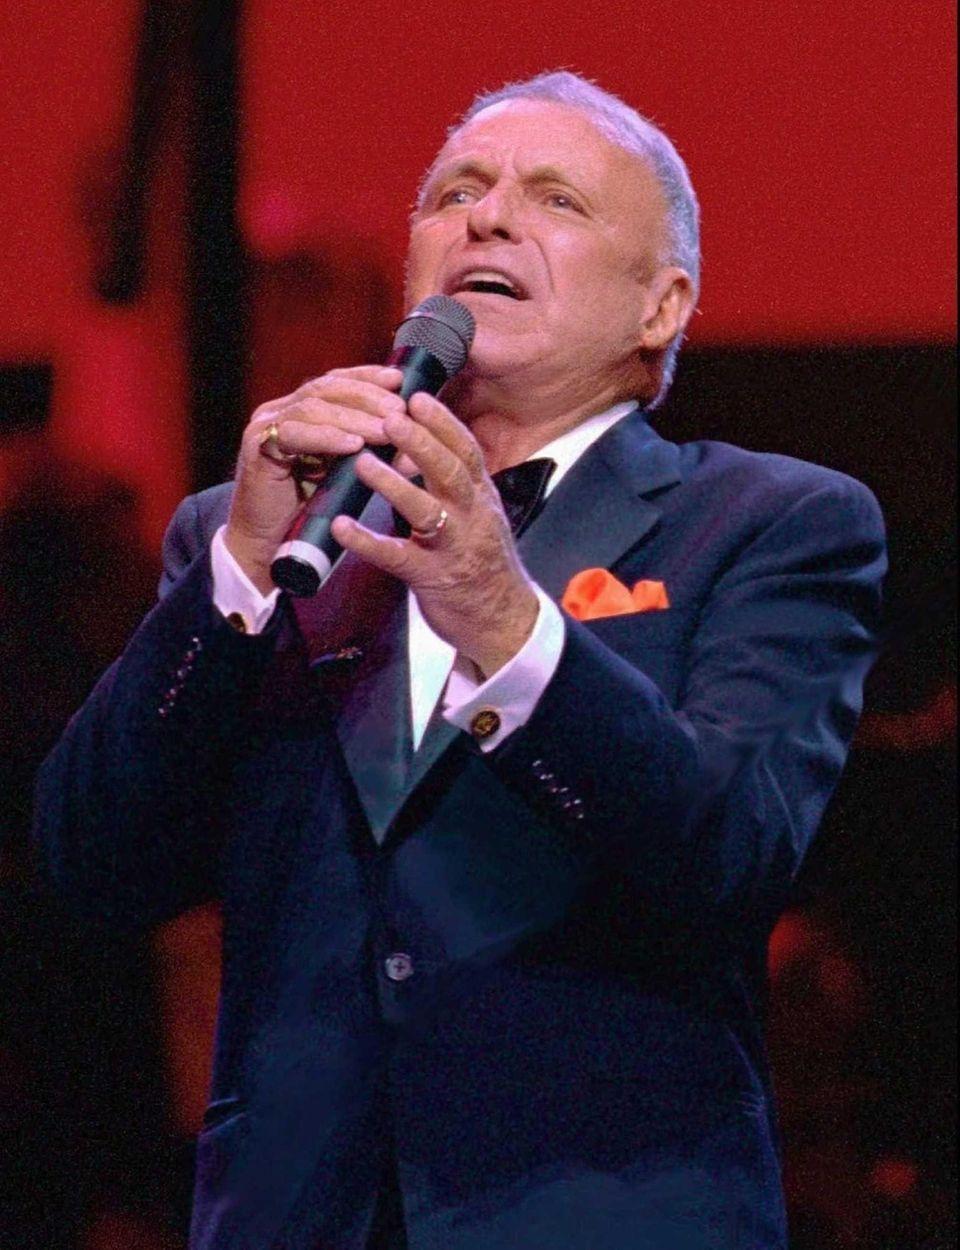 Frank Sinatra performs at Radio City Music Hall